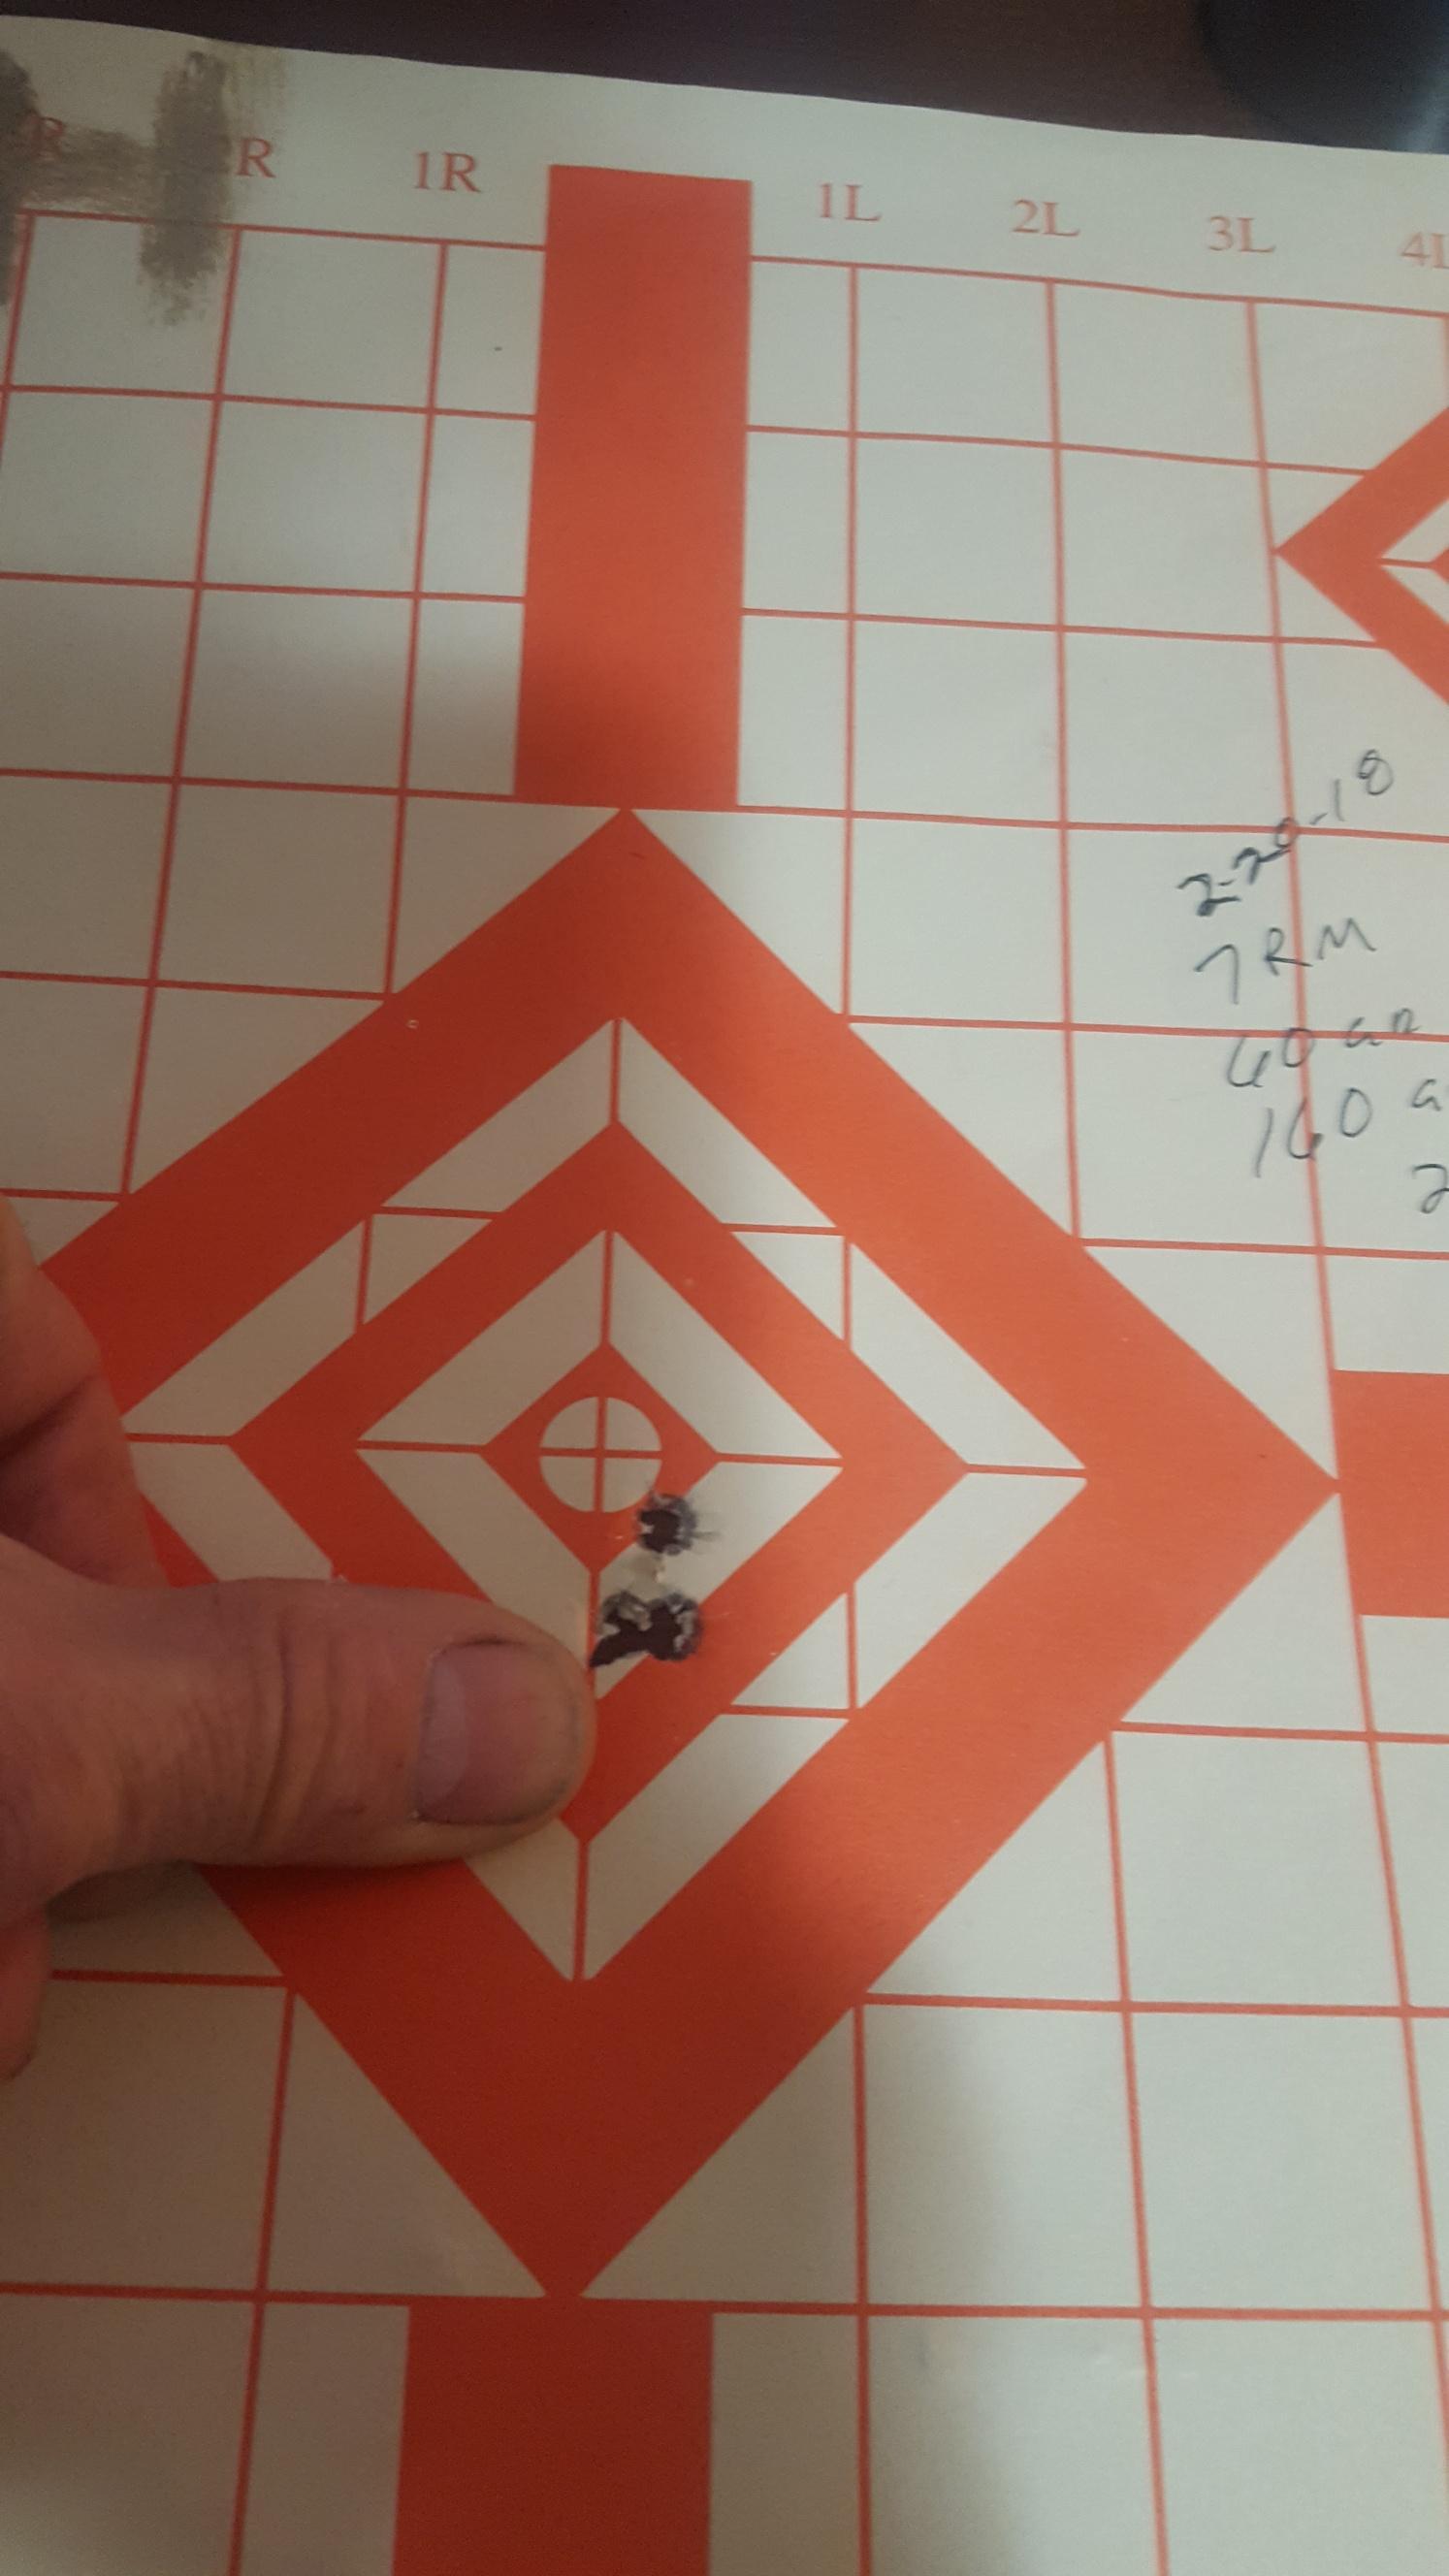 7mm Rem Mag 175 eld-x verses 175 ABLR WOW!!!!! | Long Range Hunting